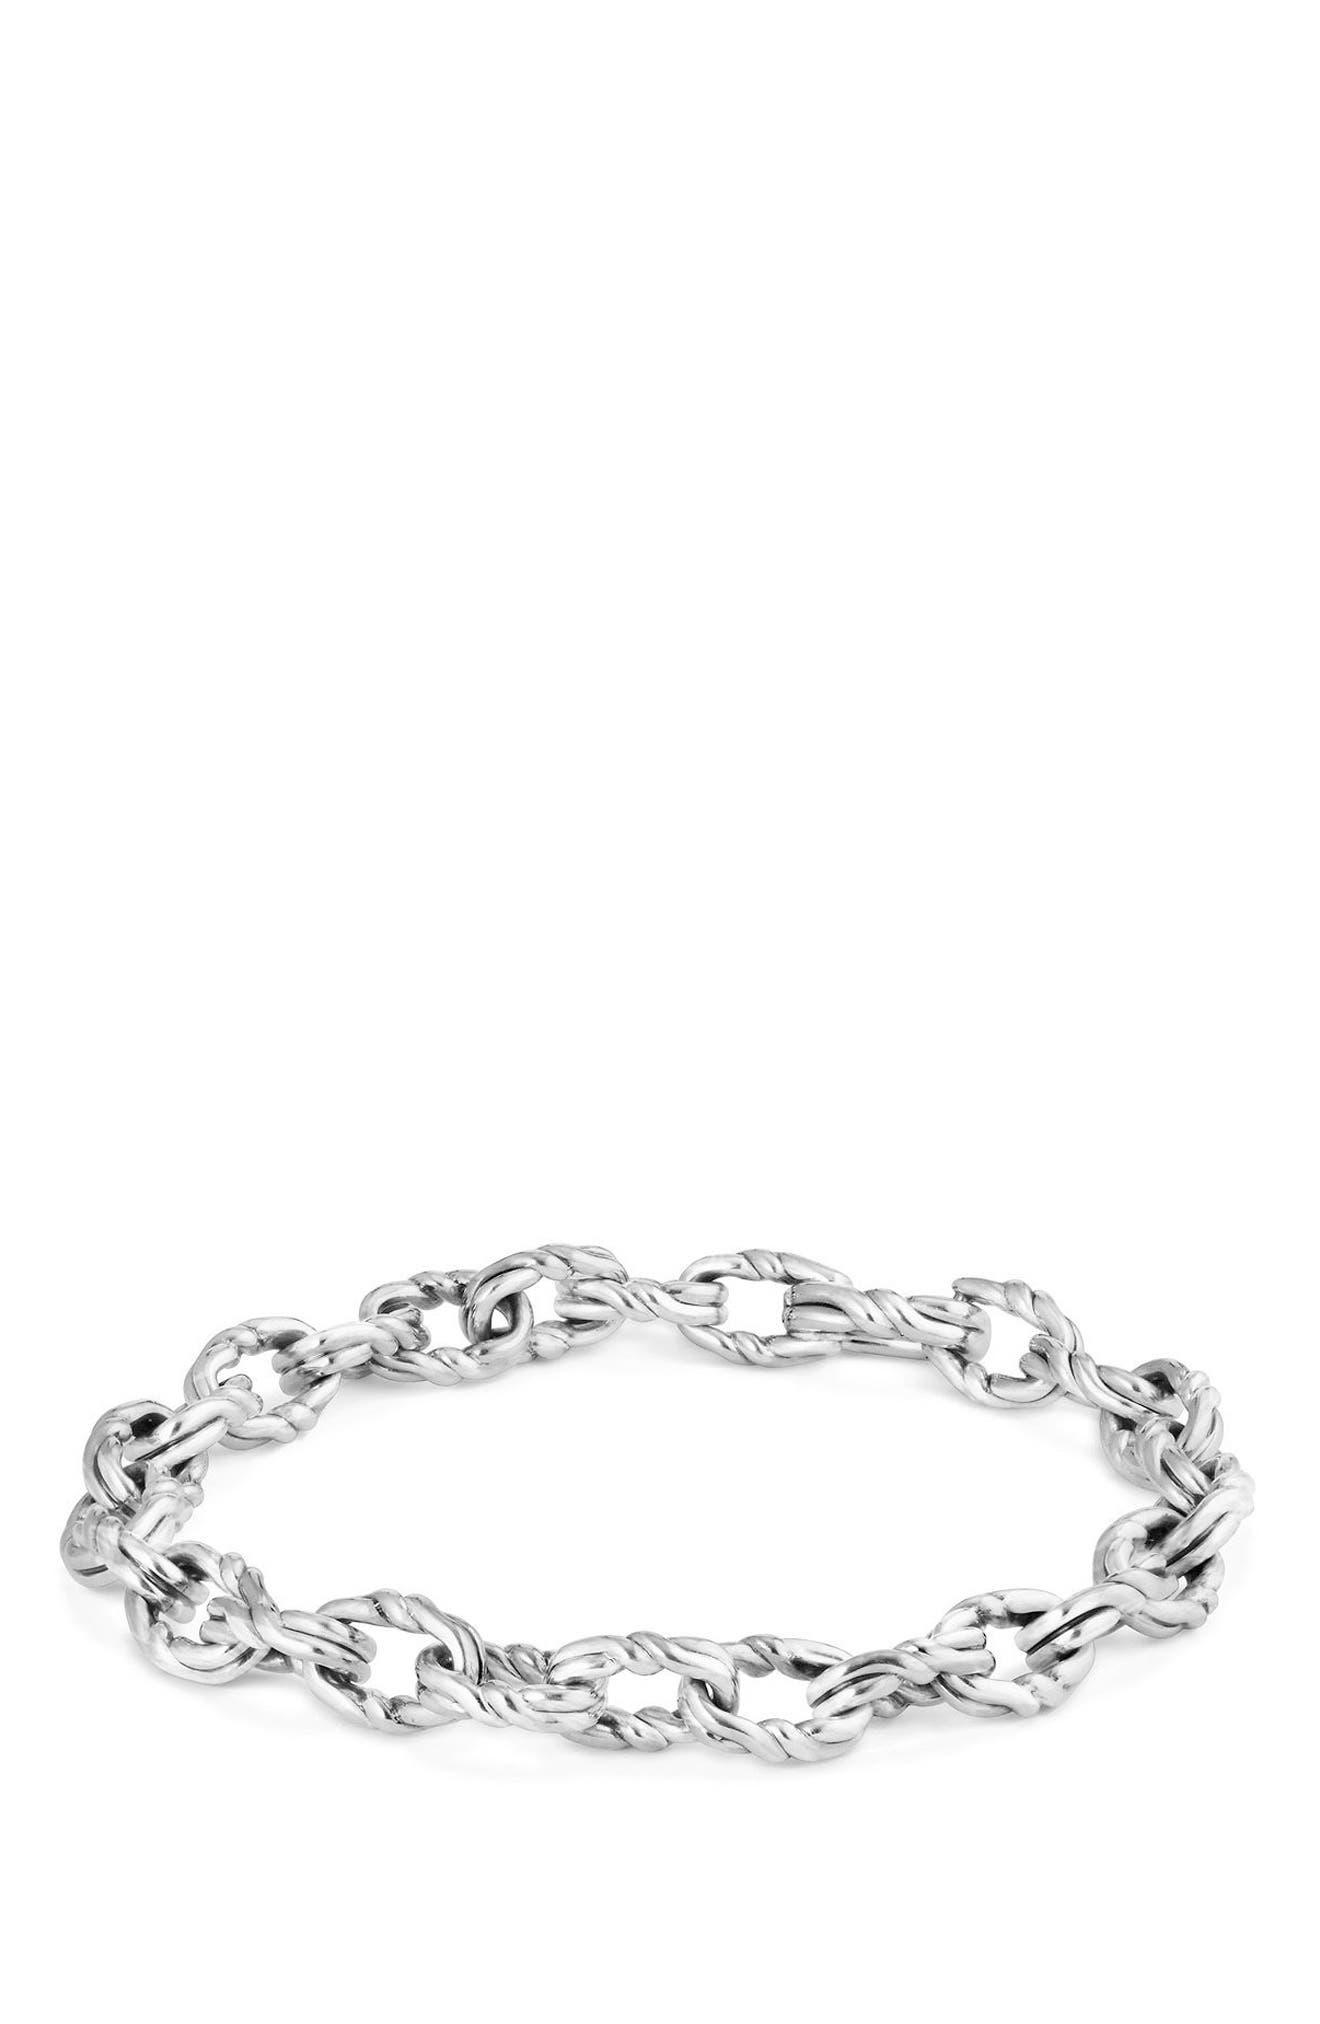 David Yurman Continuance Chain Bracelet